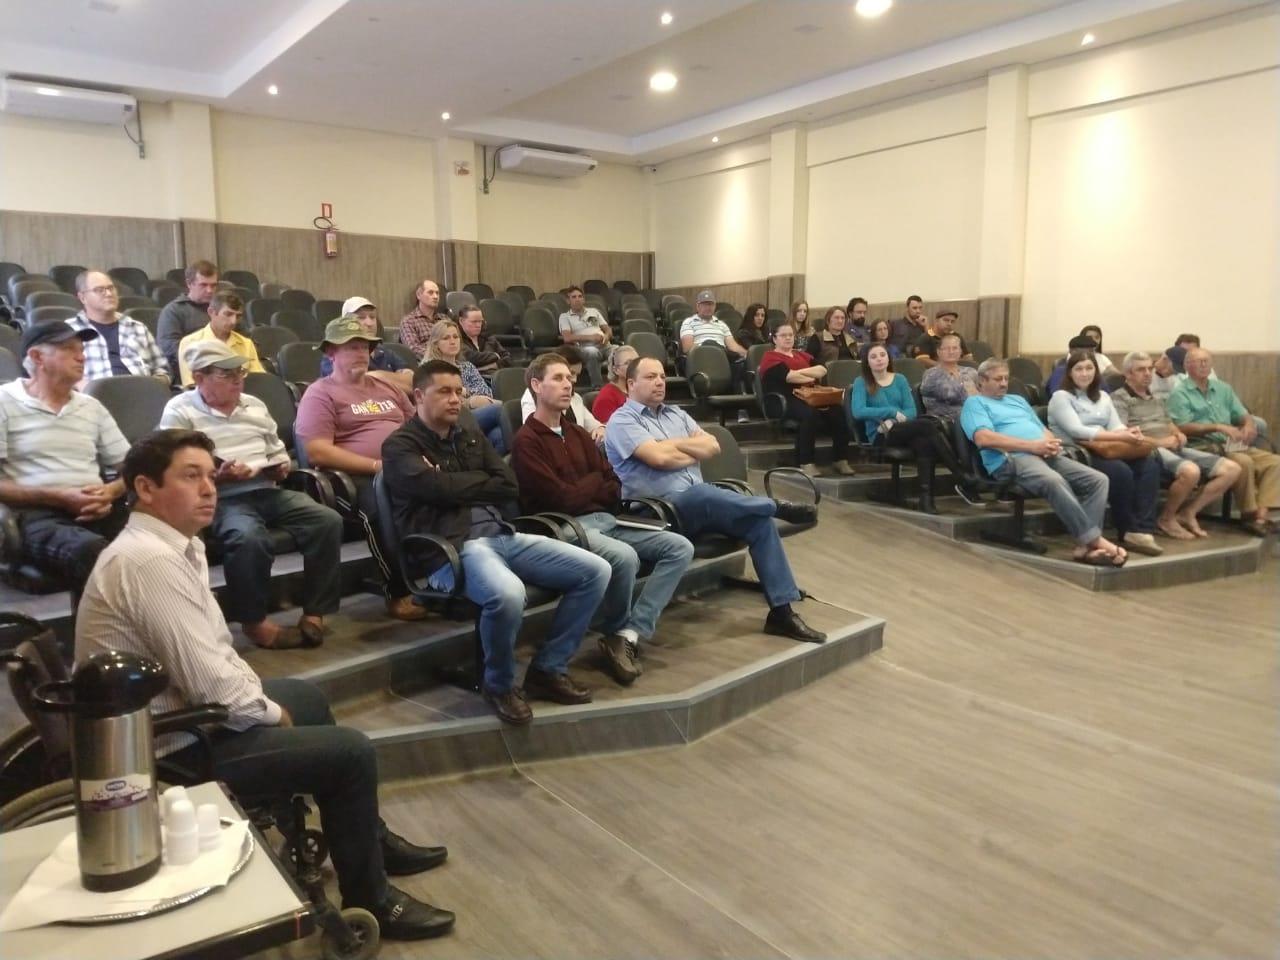 Rodrigo-Machado-26-06-4